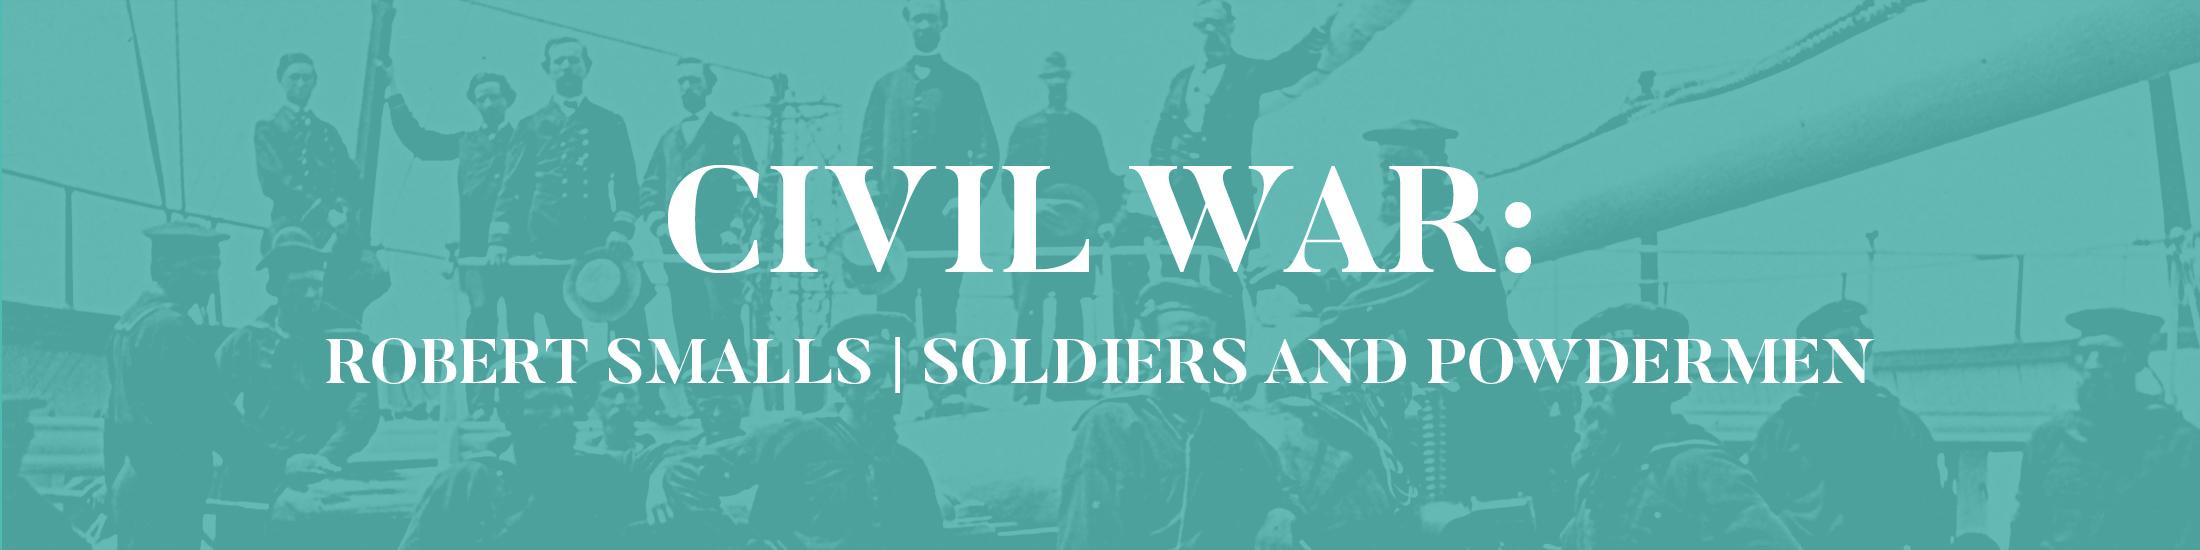 Civil War: Robert Smalls, soldiers and powdermen